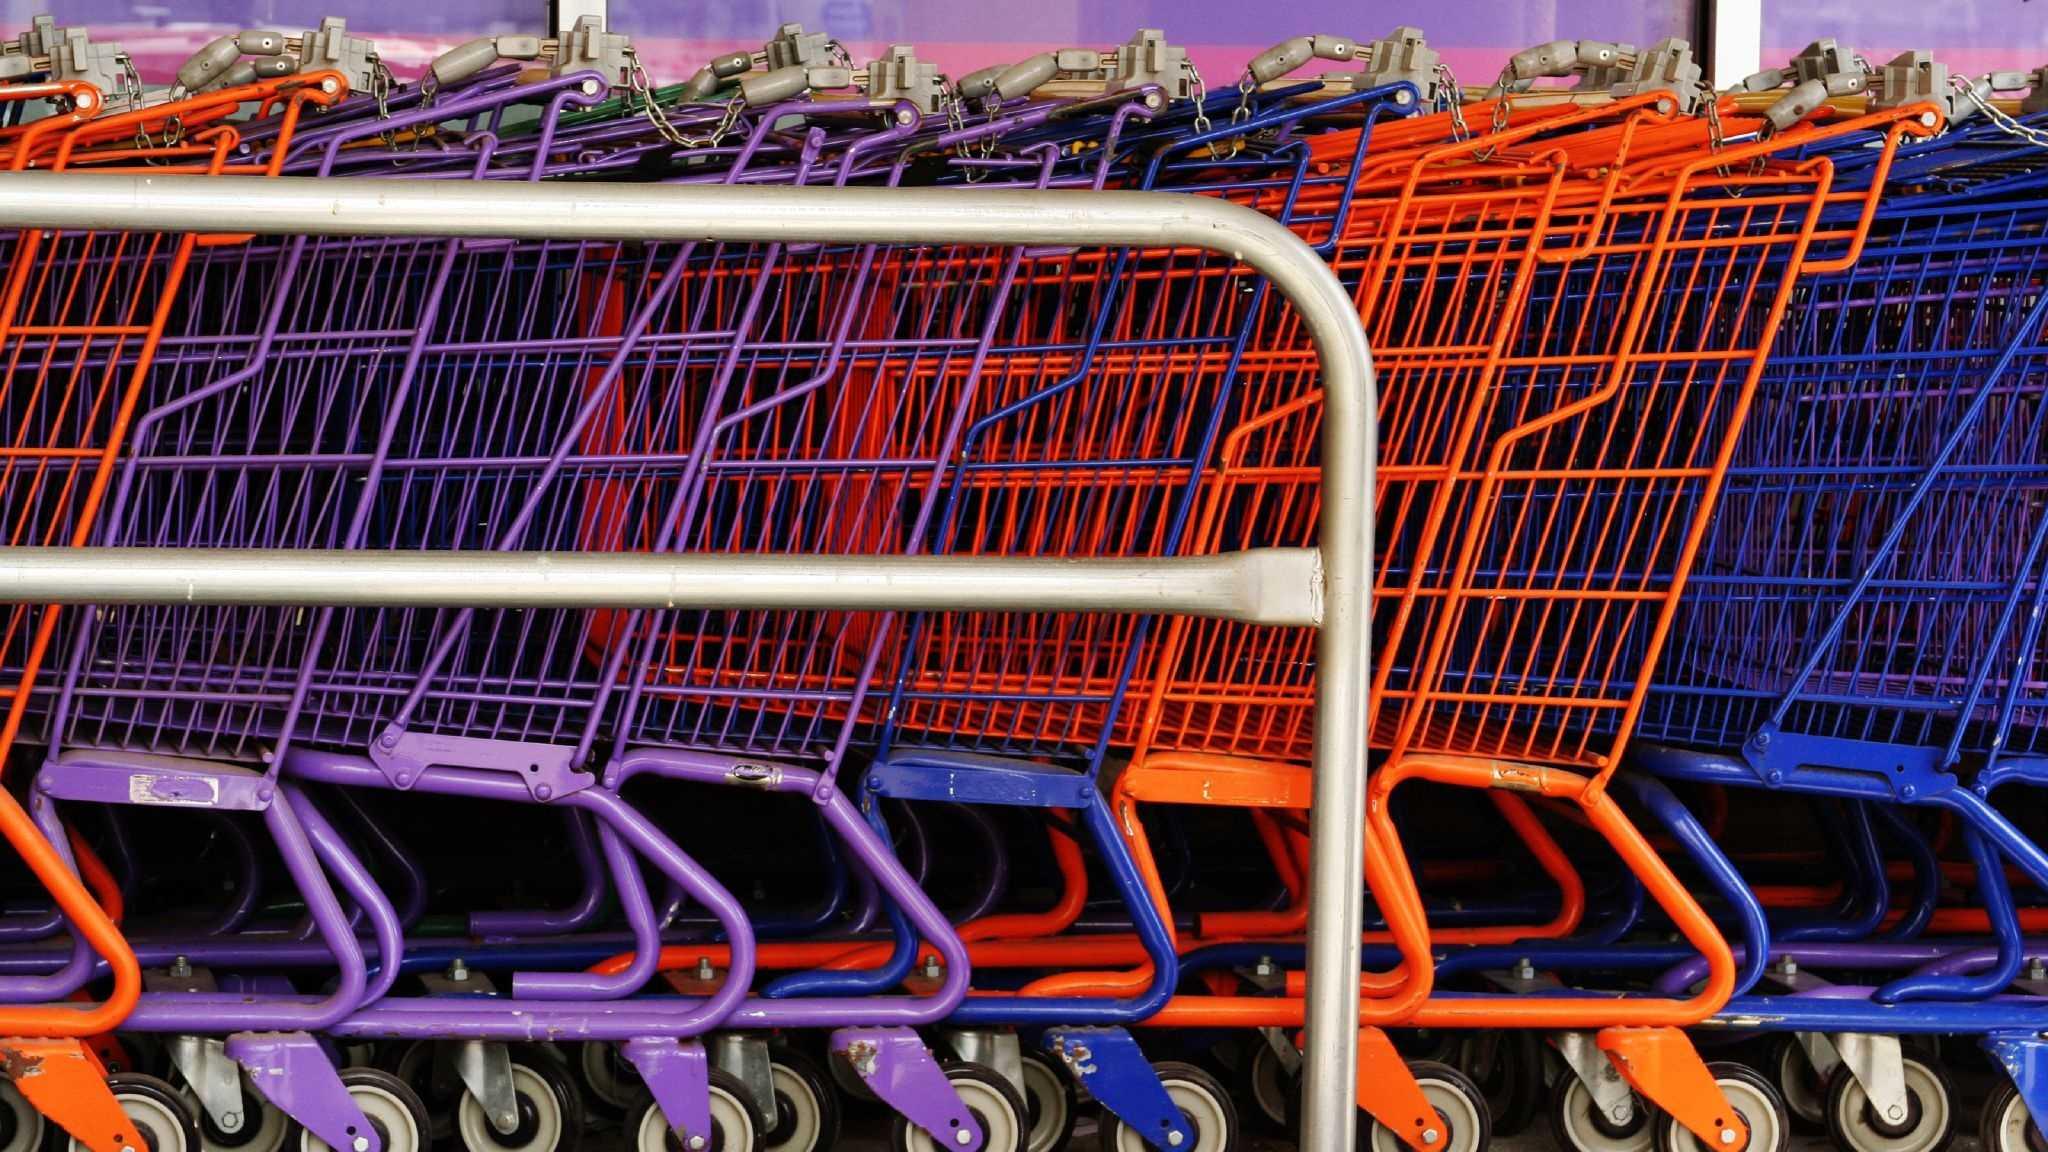 Colourful_shopping_carts.jpg